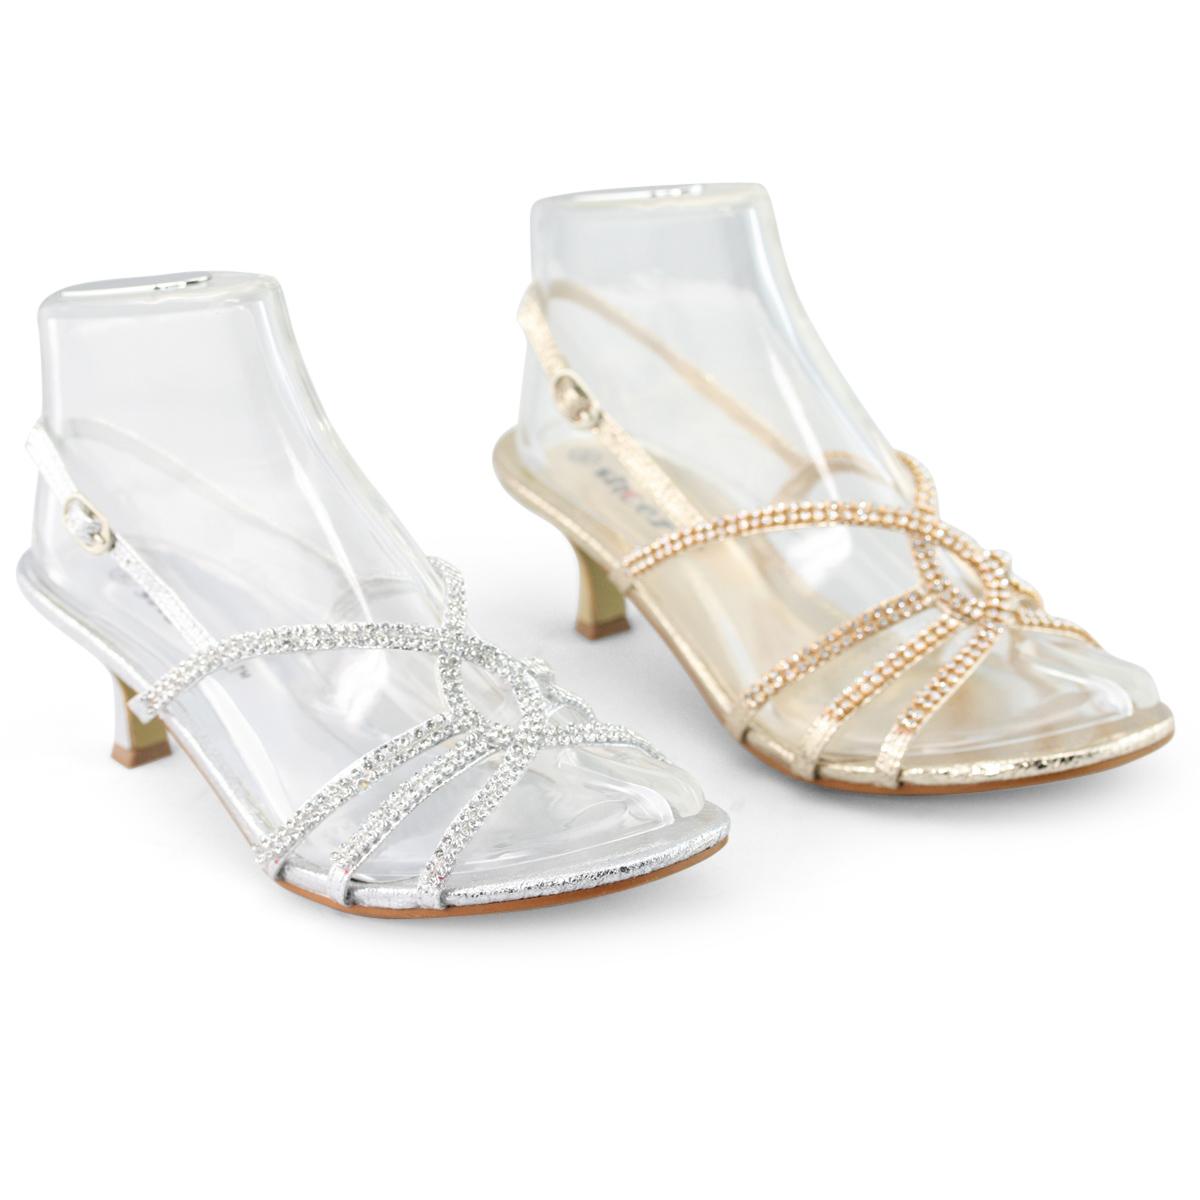 wedding sandals NEW Evening womens diamante strappy kitten high heels bridal sandals shoes